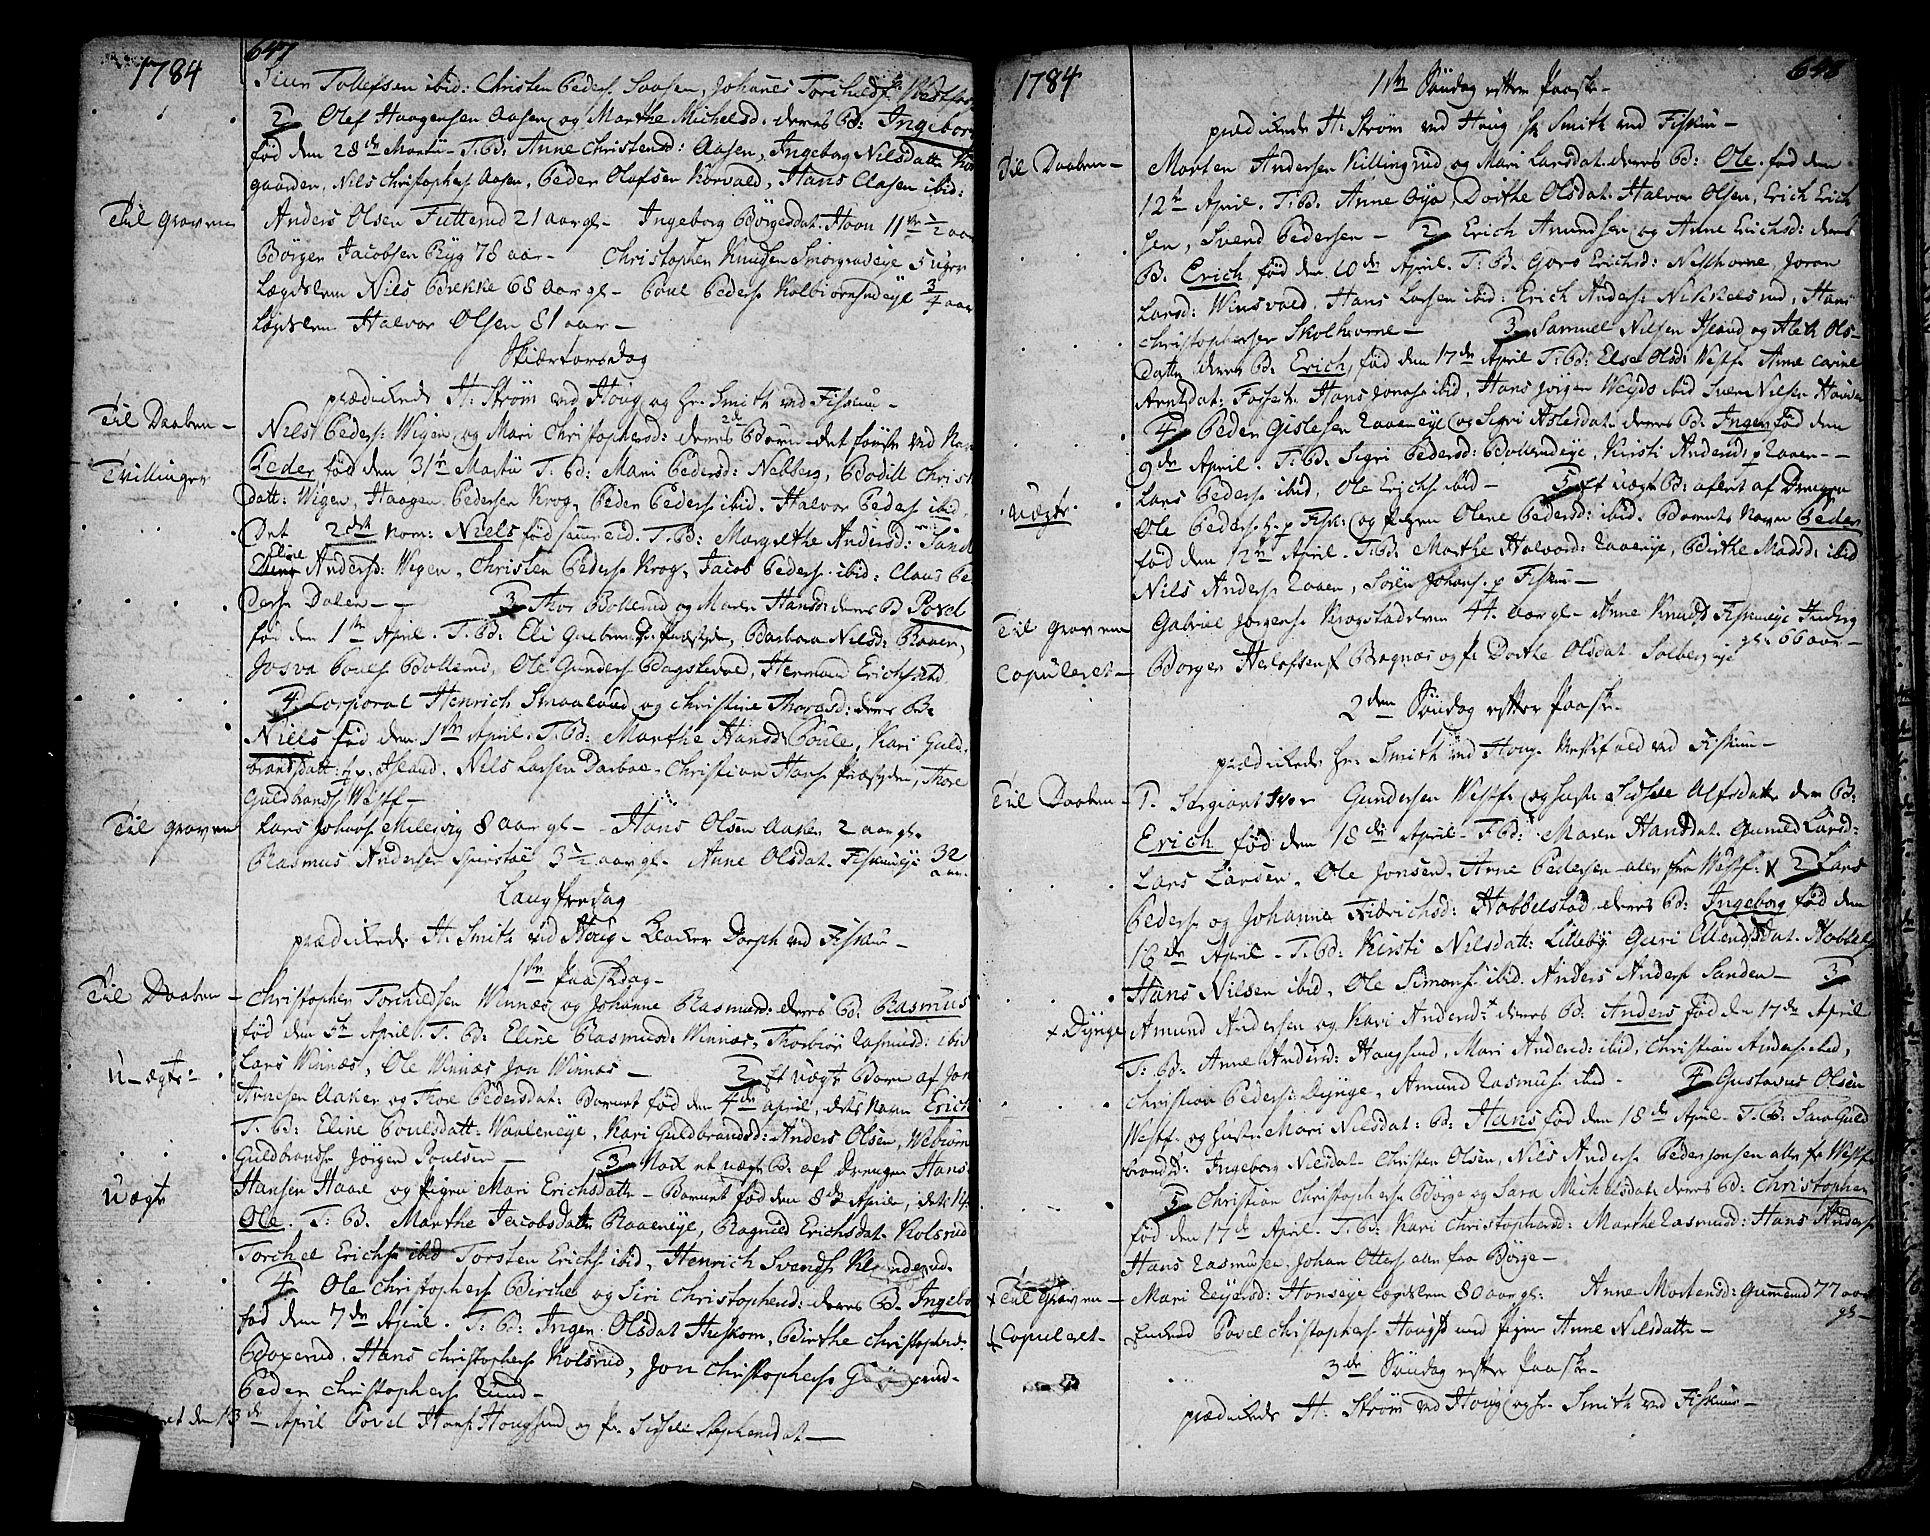 SAKO, Eiker kirkebøker, F/Fa/L0008: Ministerialbok nr. I 8, 1764-1788, s. 647-648